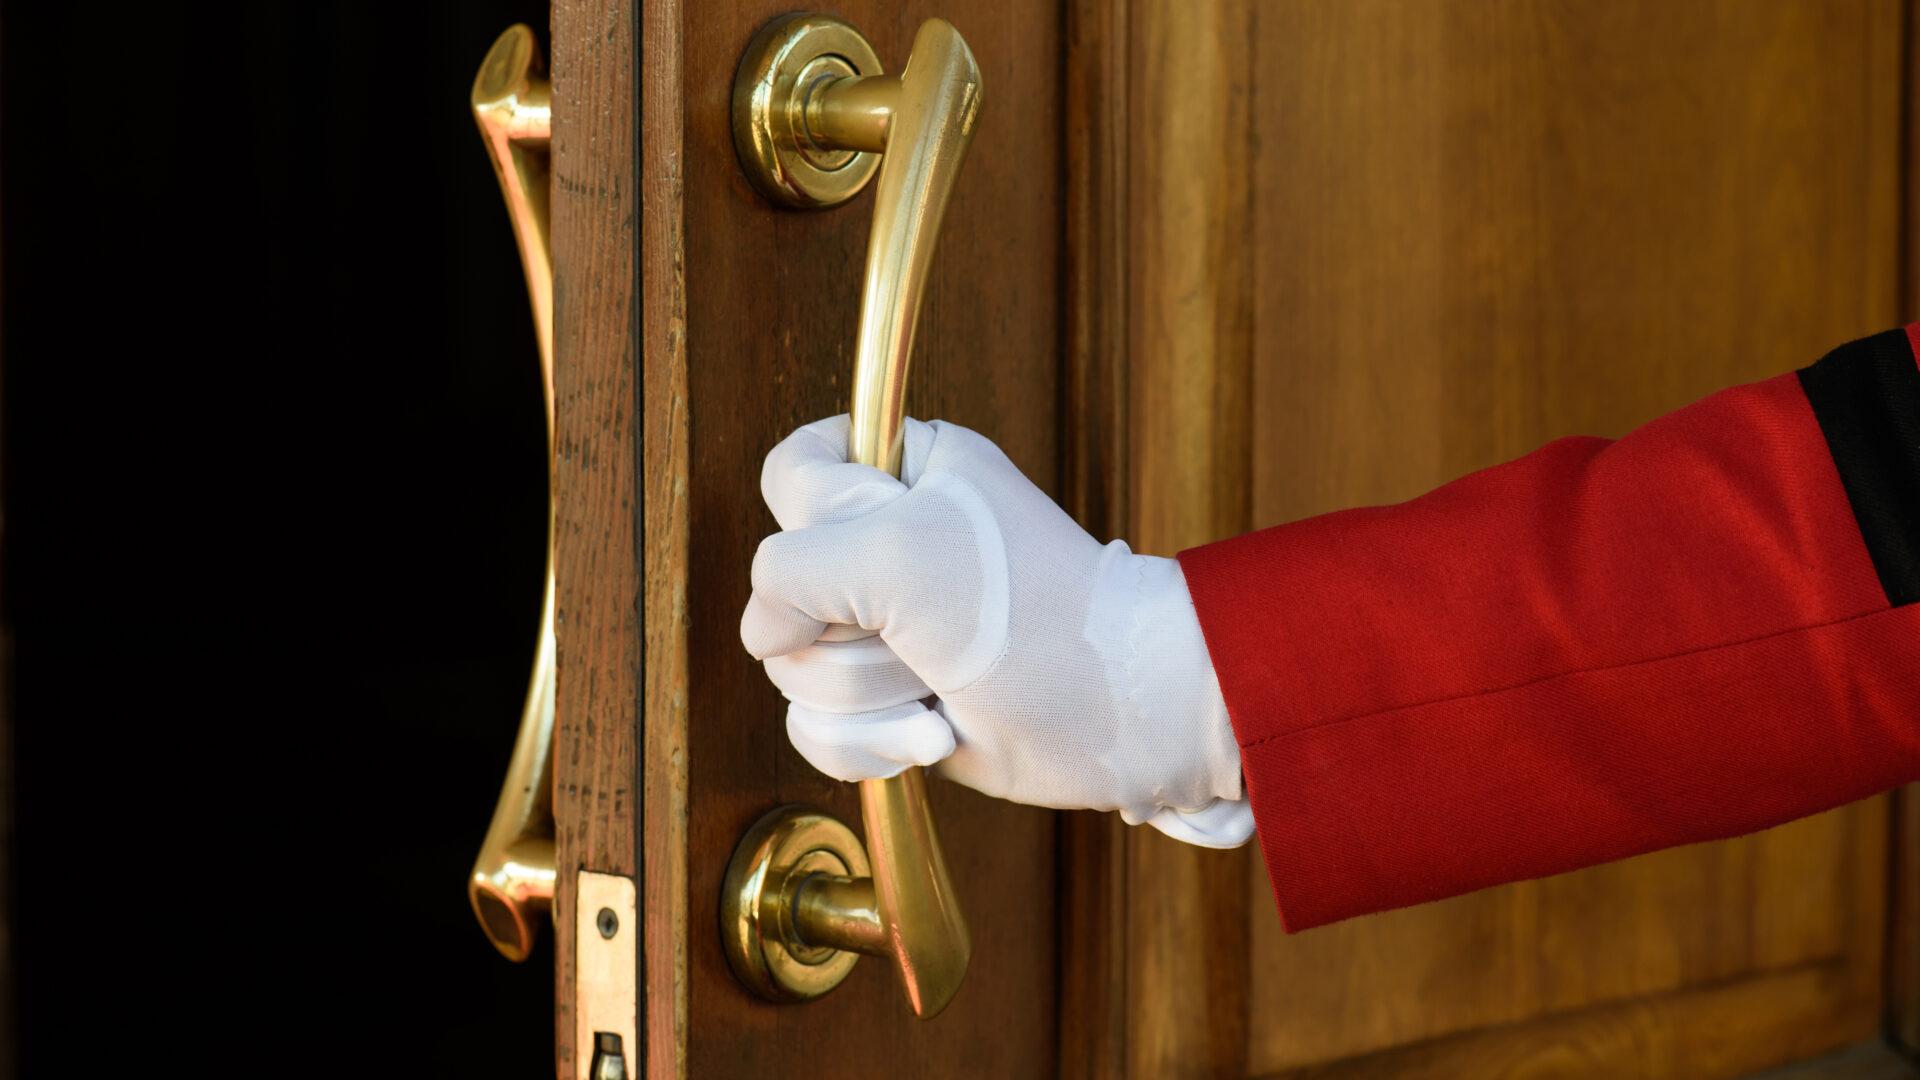 Doorman opens door for clients with white gloves